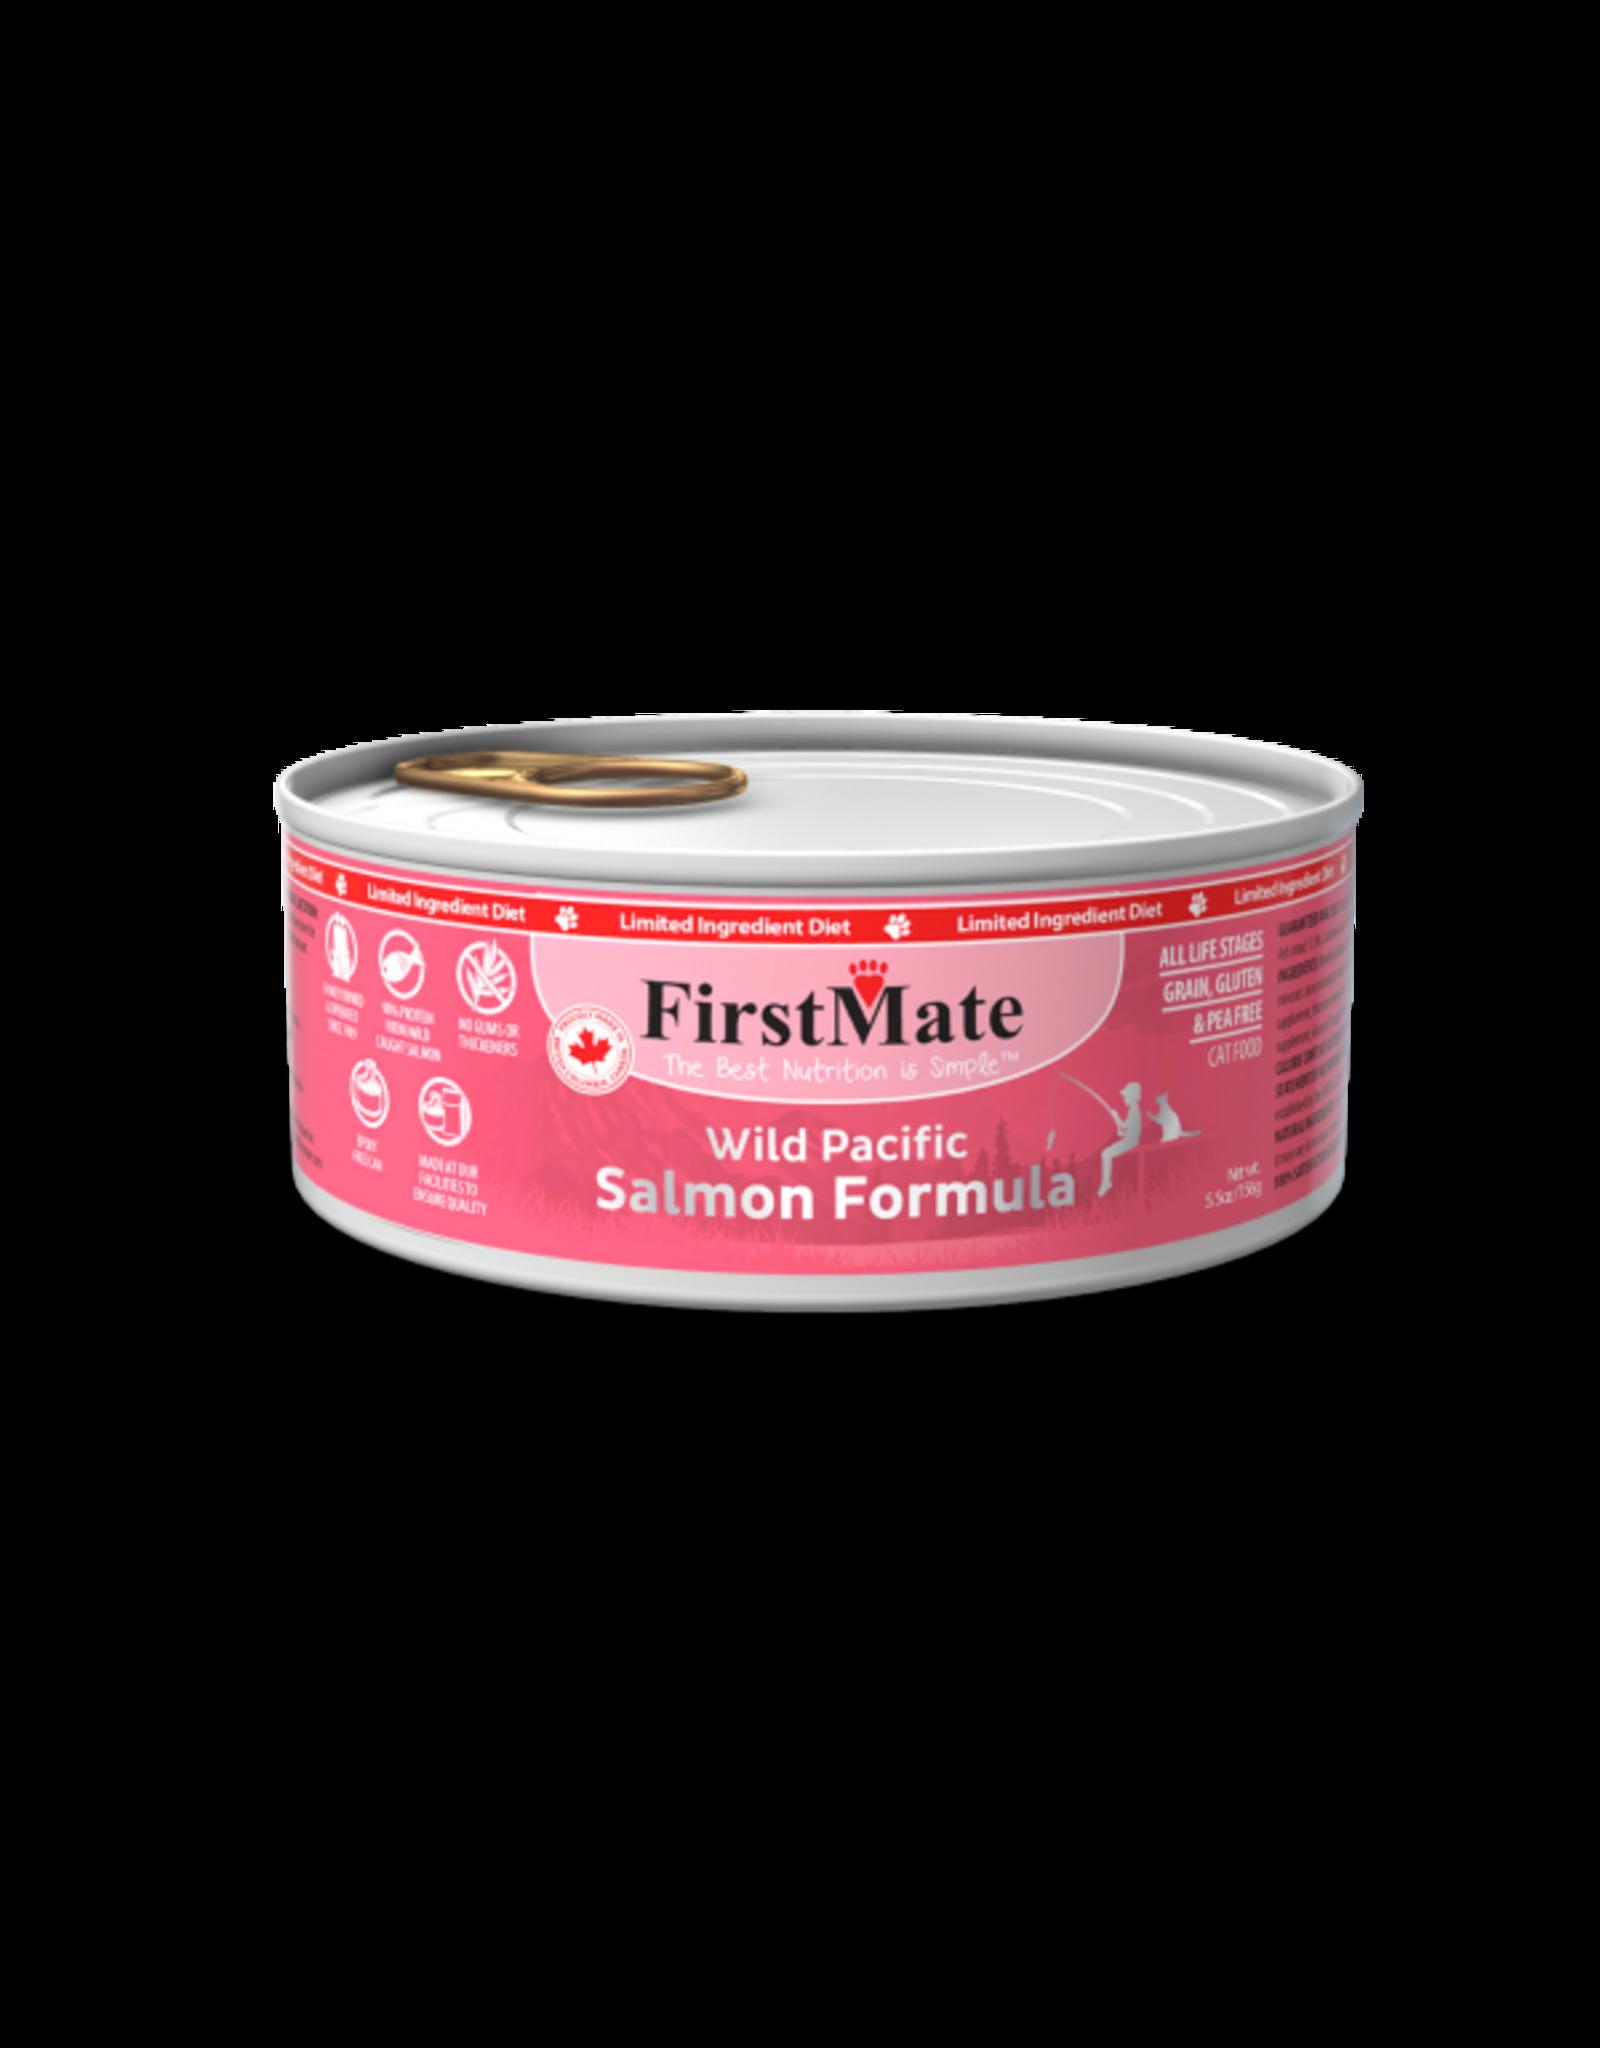 First Mate First Mate Cat Salmon Formula